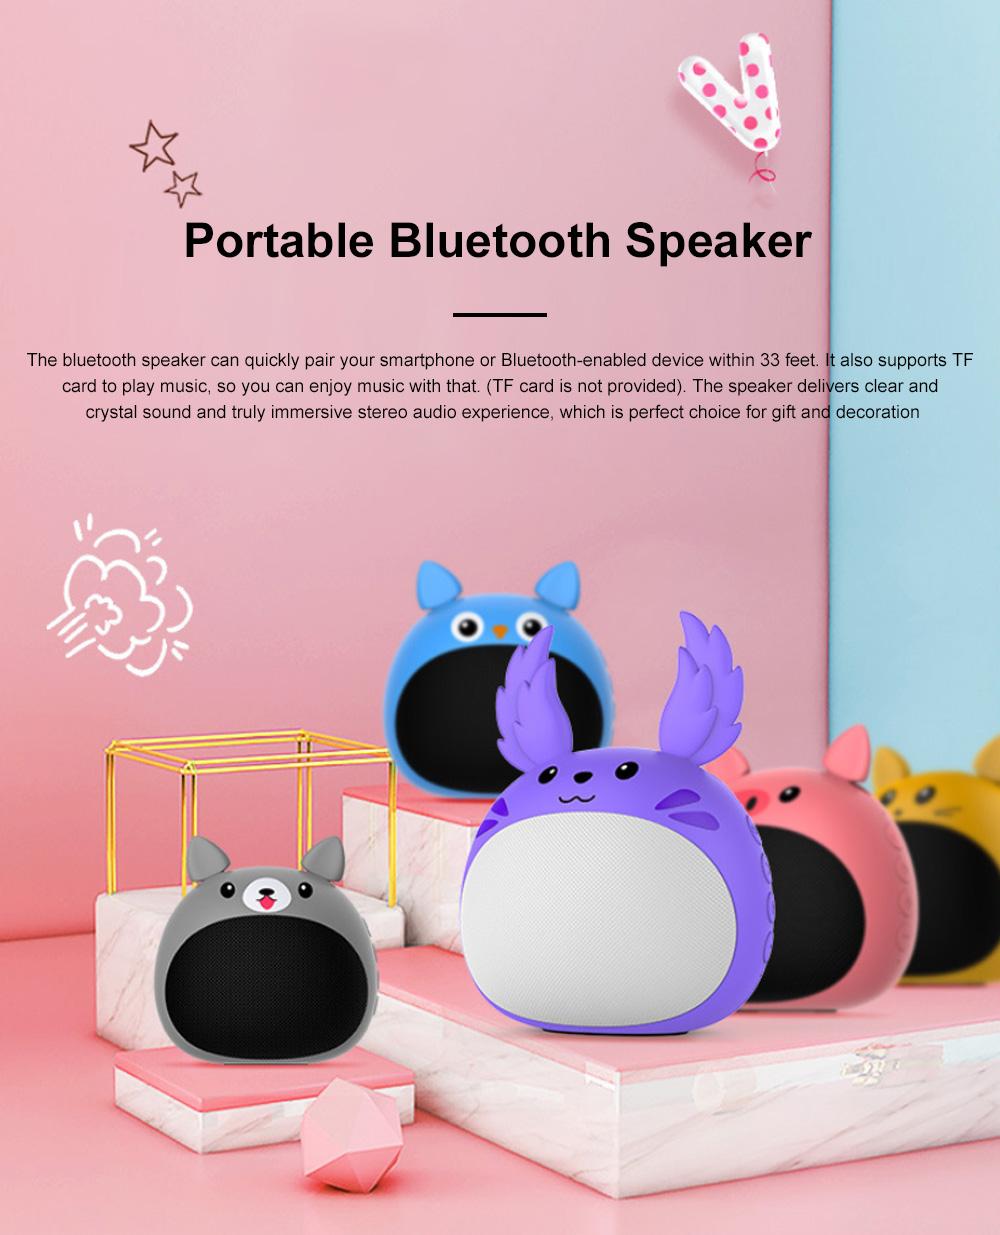 Portable Bluetooth Speaker Stereo Pairing Speaker High Definition Sound Cute Cartoon Wireless Speaker Ideal Gift for Girls Kids 0